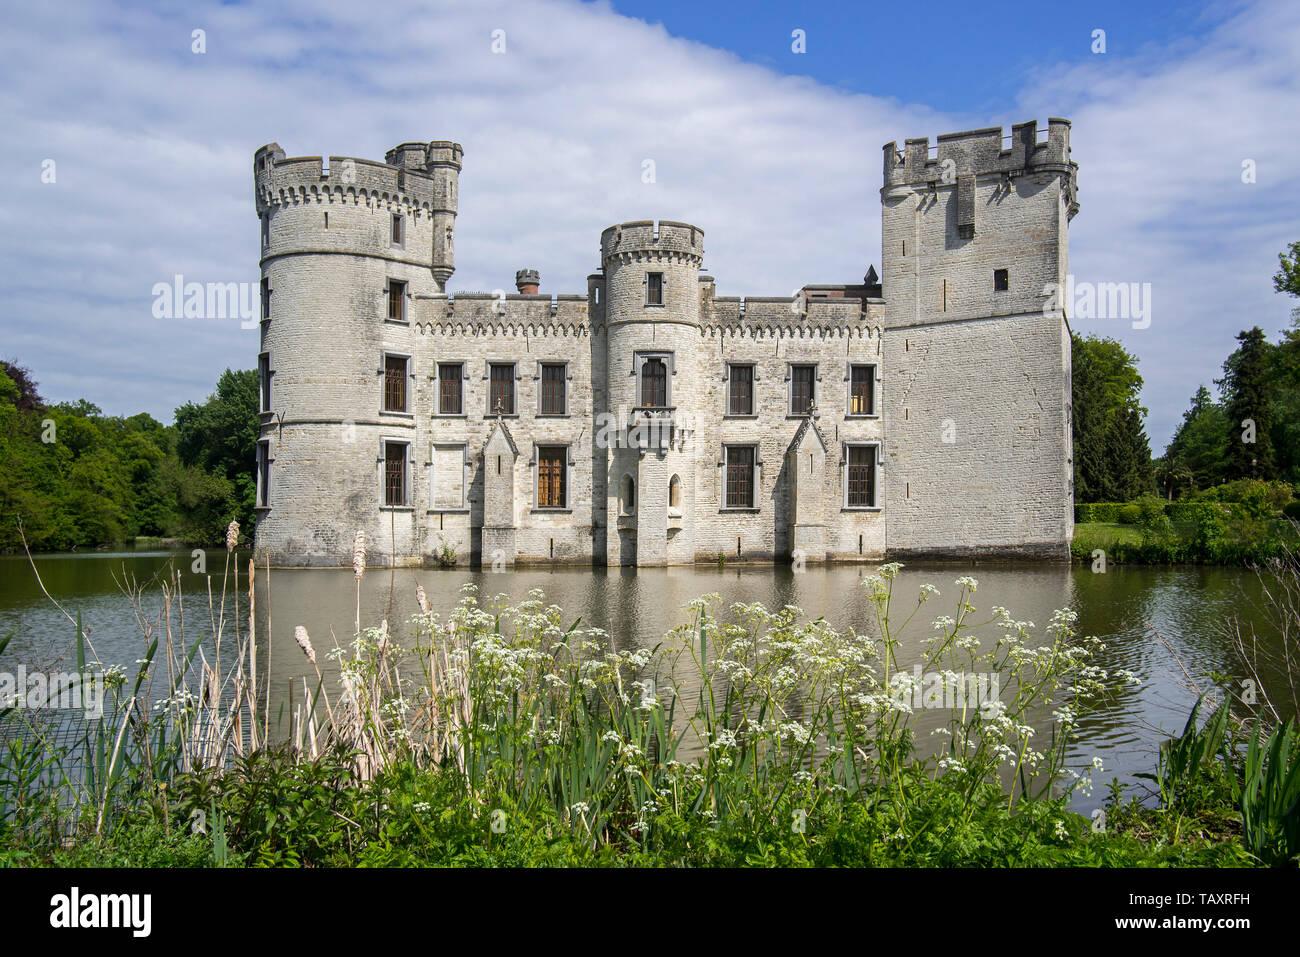 Neo-Gothic Bouchout Castle / Kasteel van Bouchout in the Botanic Garden Meise near Brussels, Belgium - Stock Image